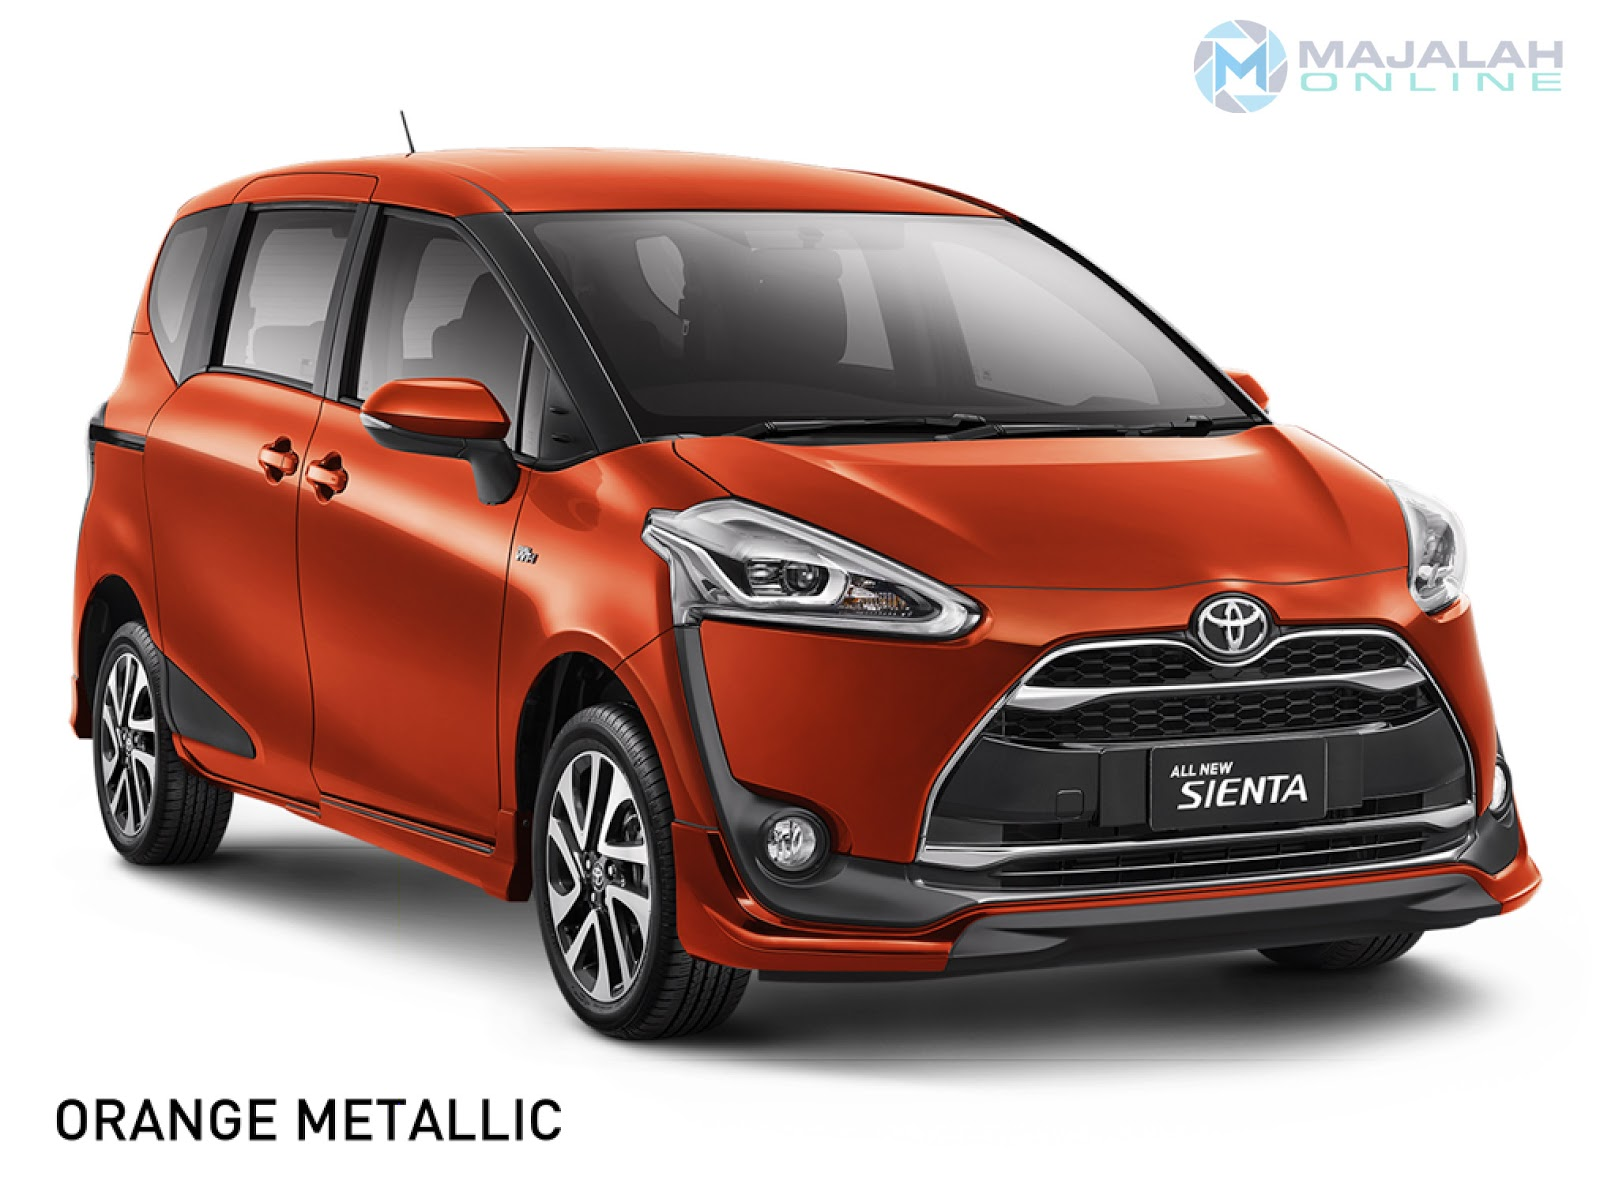 Warna Grand New Avanza 2018 Olx 2016 Toyota Sienta Promo Jakarta